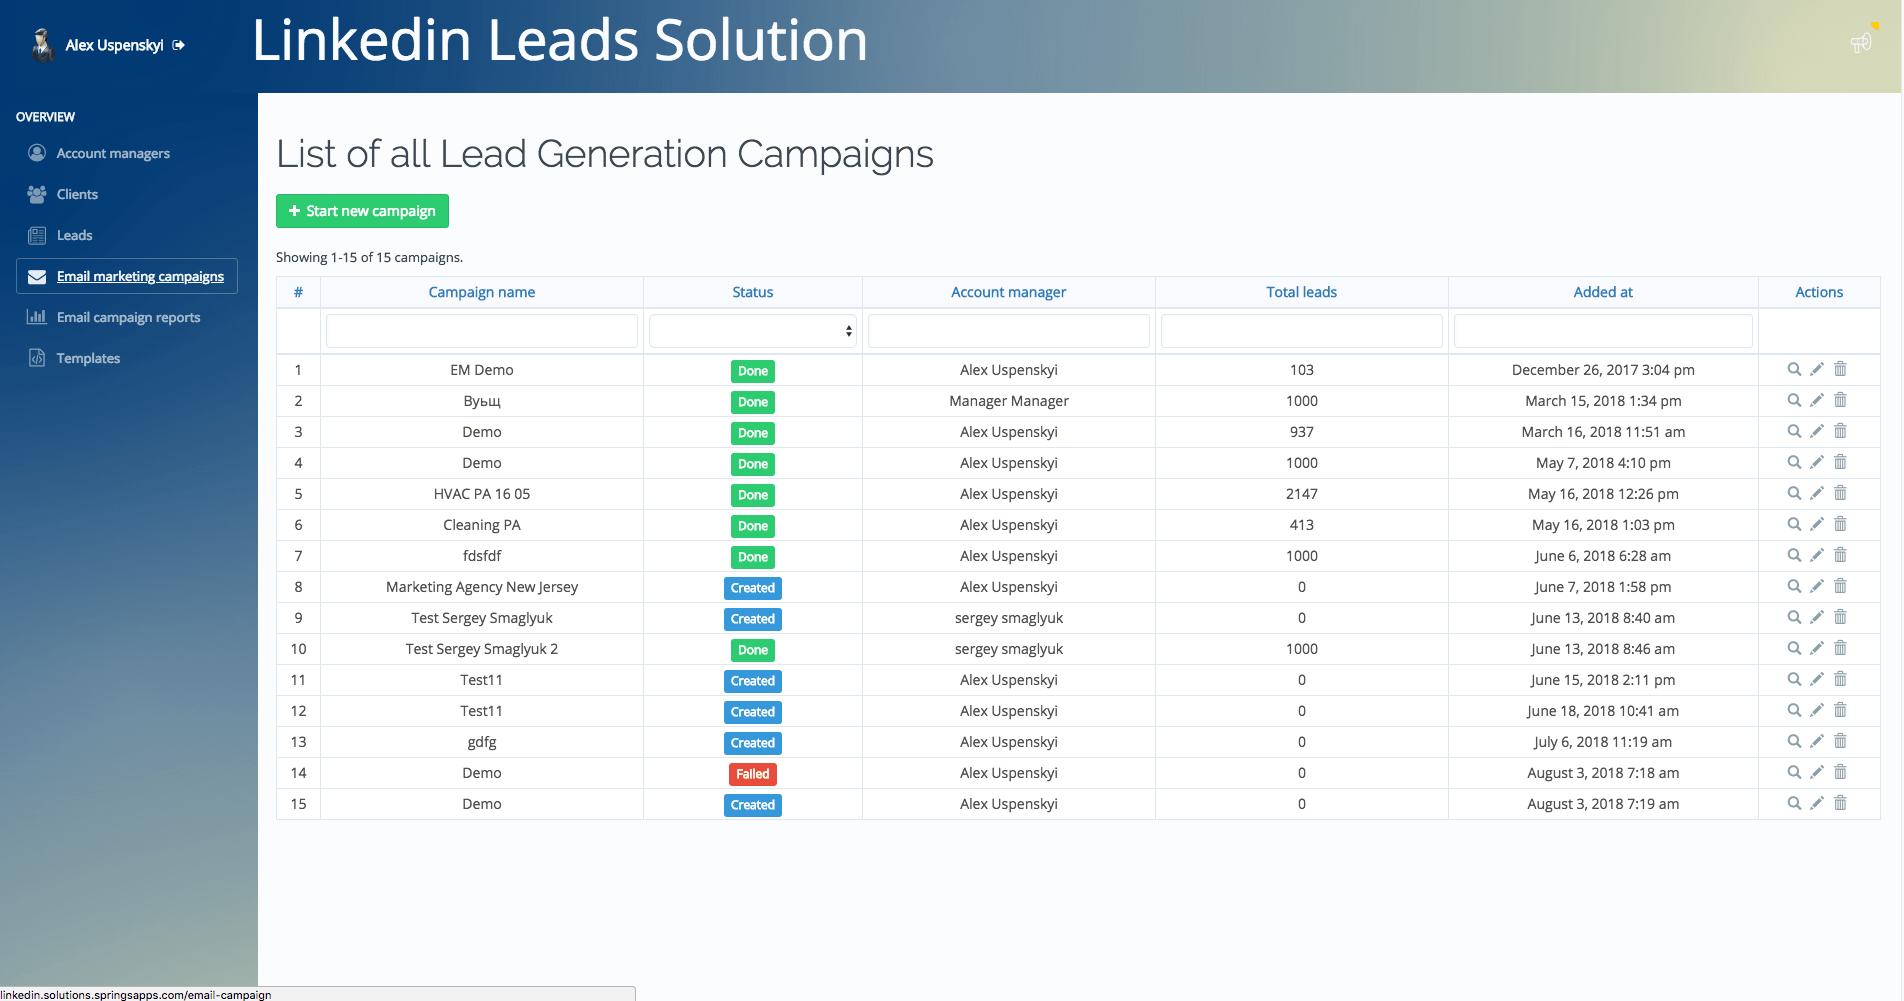 linkedin-leads-solution5b6c585d652fec1ddac9711c